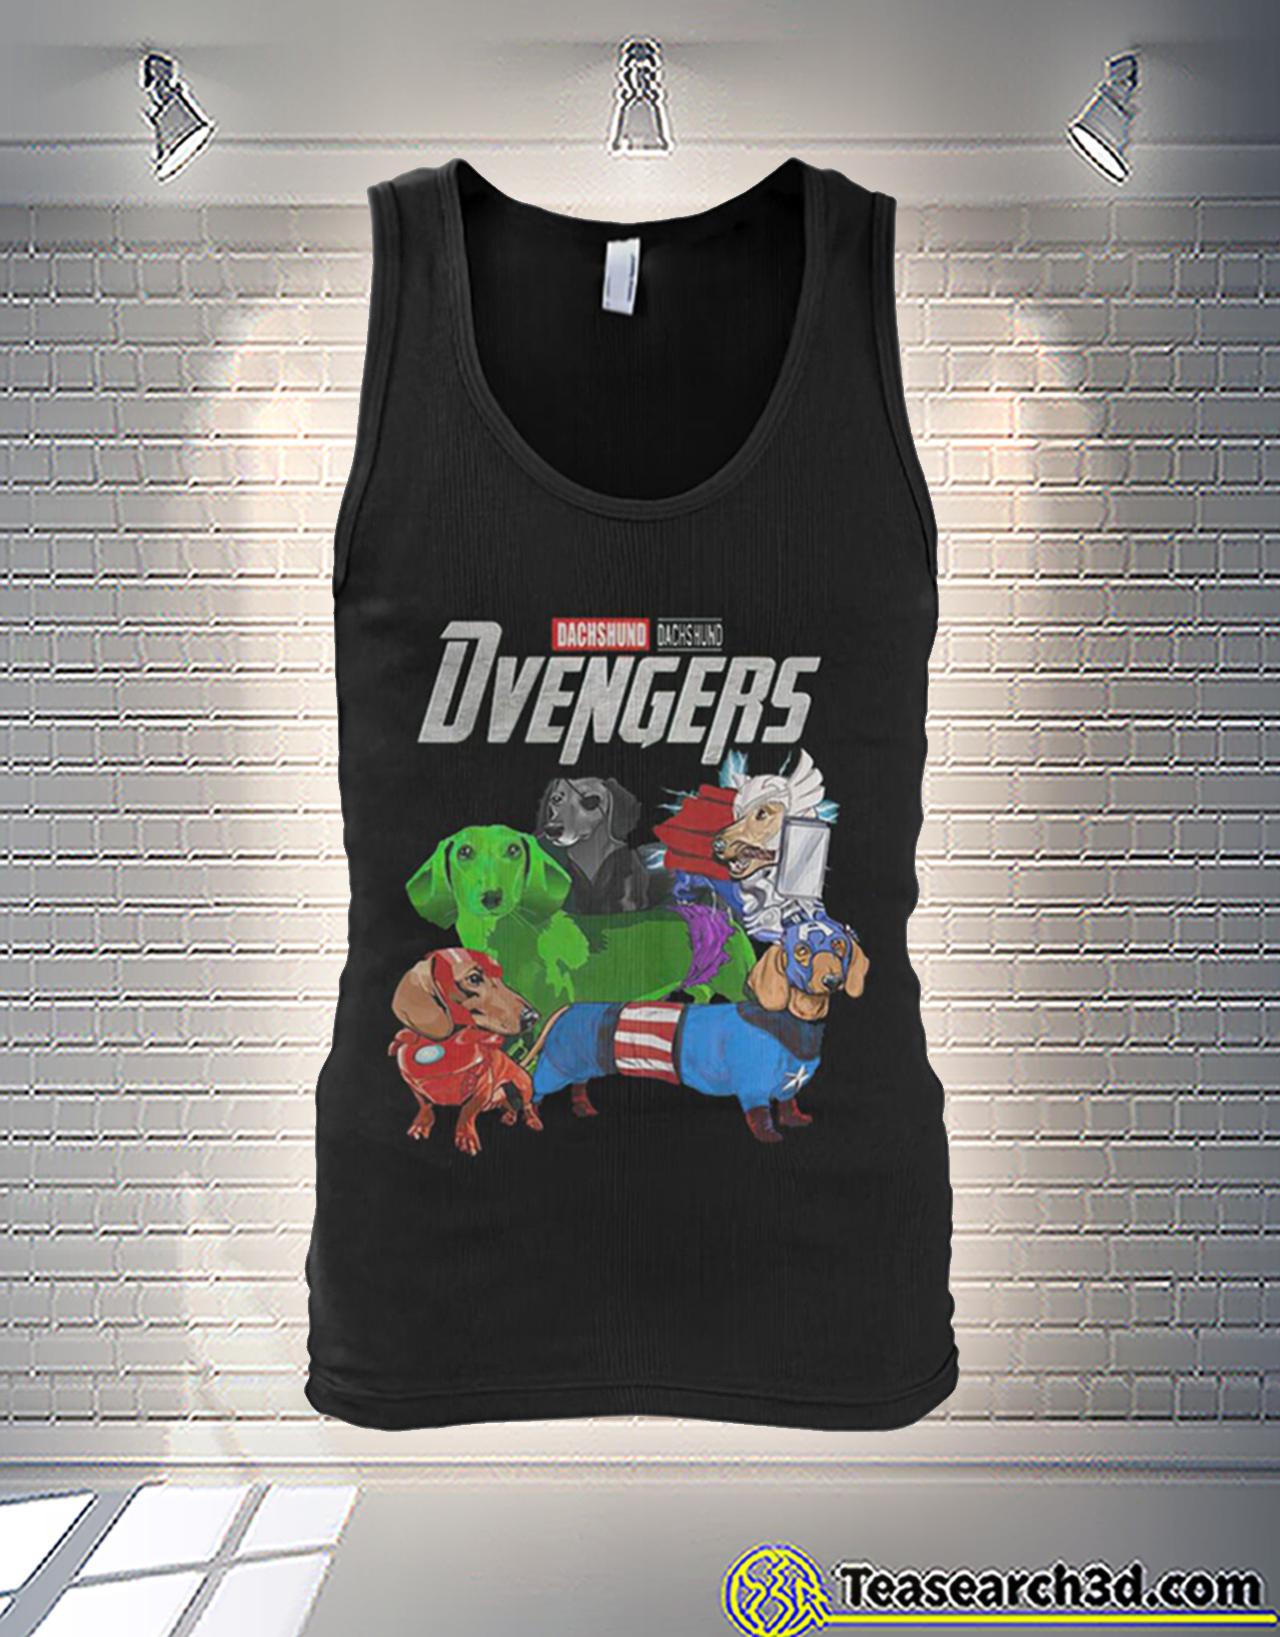 Dachshund dachshund dvengers avengers tank